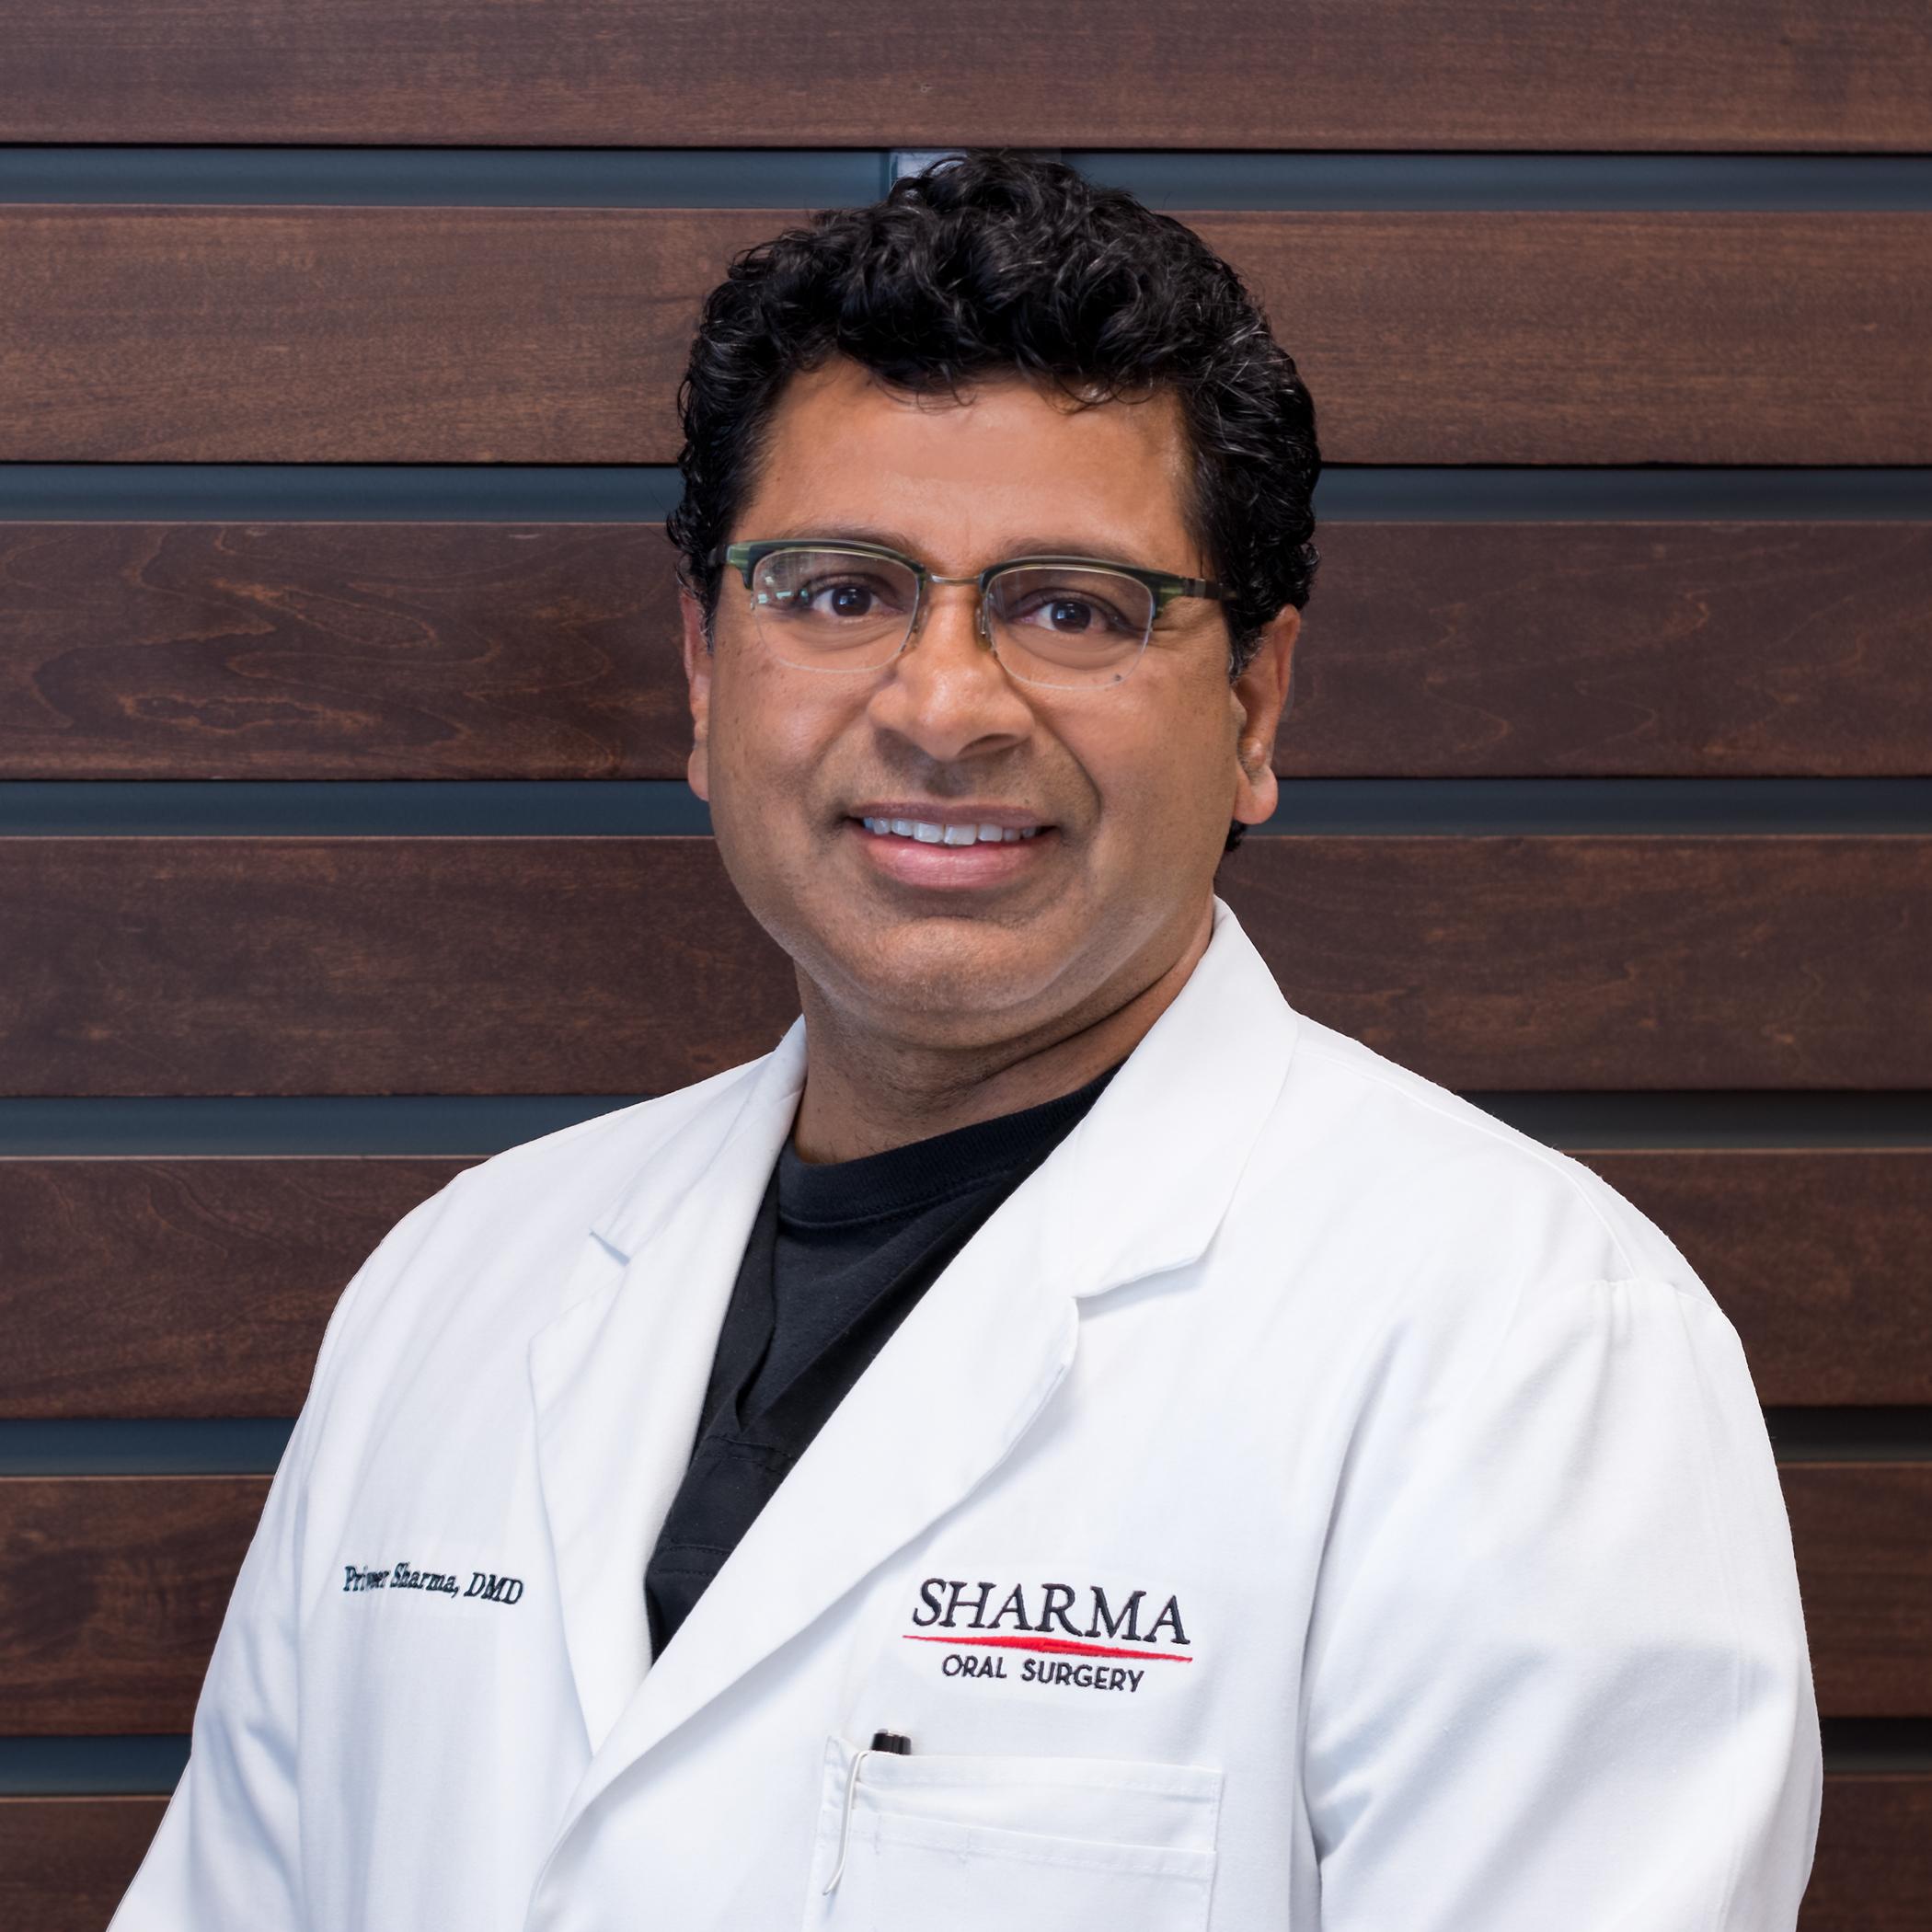 Sharma Oral Surgery -  Headshots 6 - hgih res.jpg